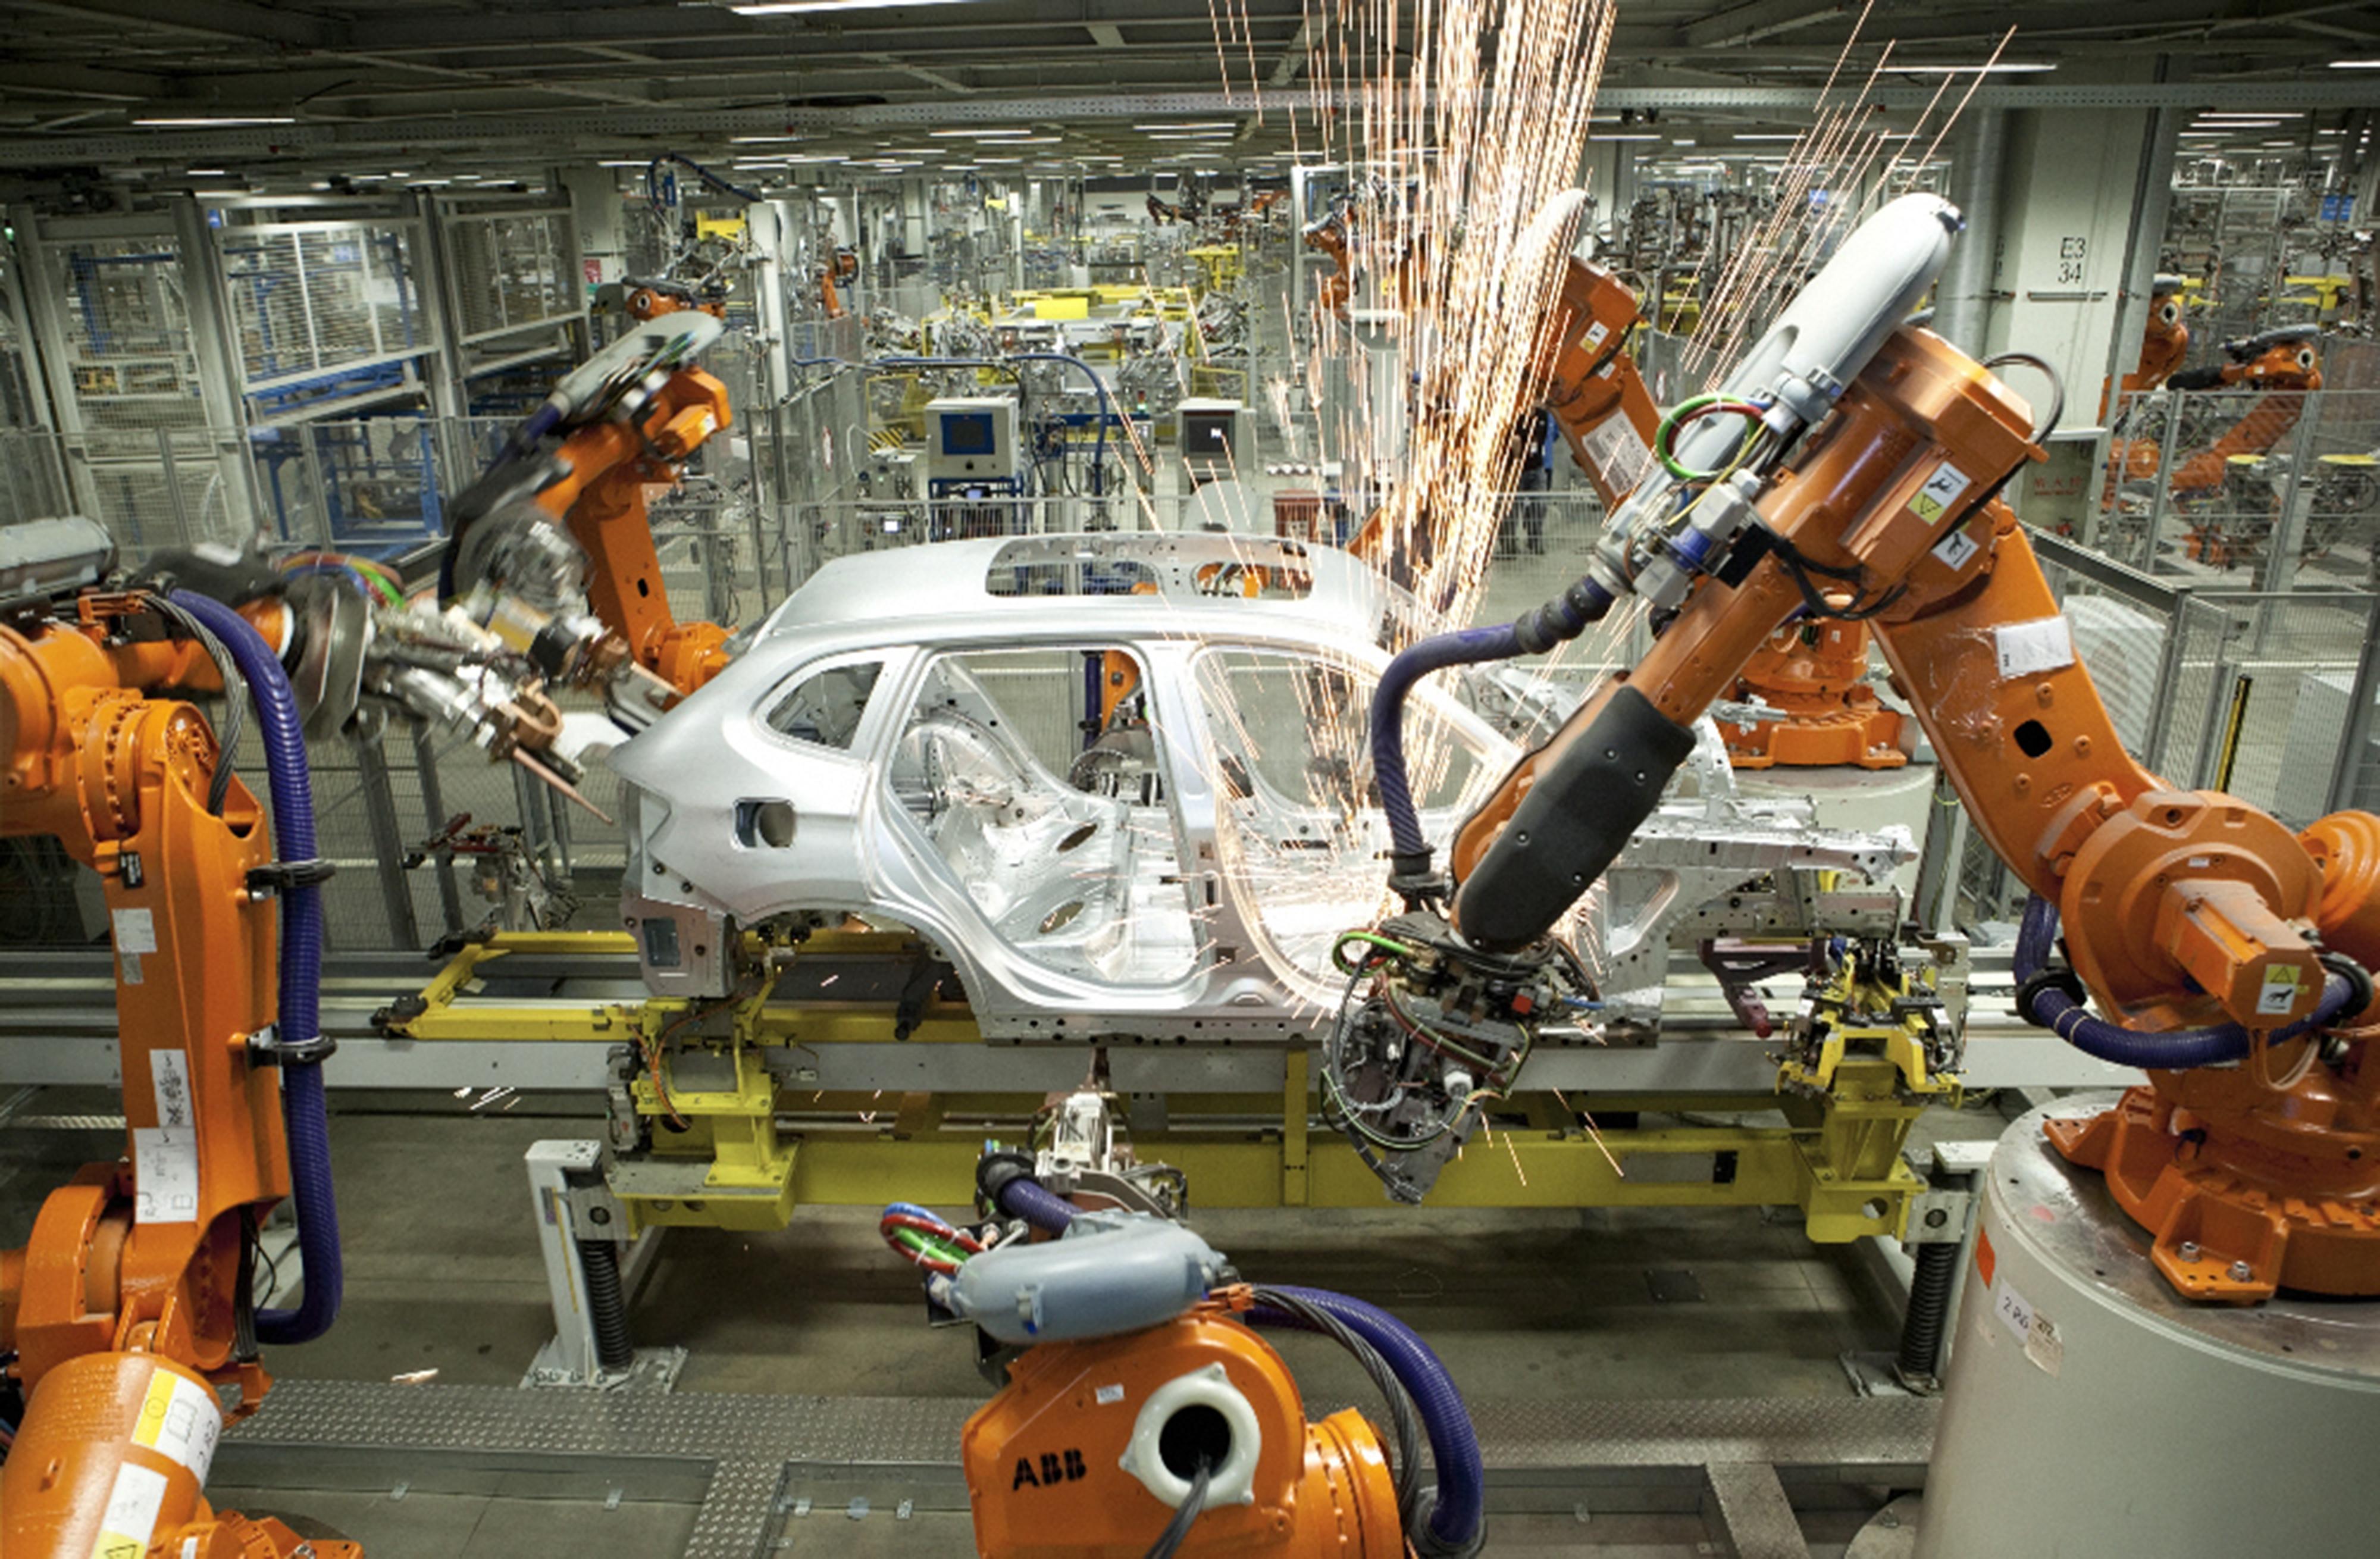 Industrie plant vision - 1 8